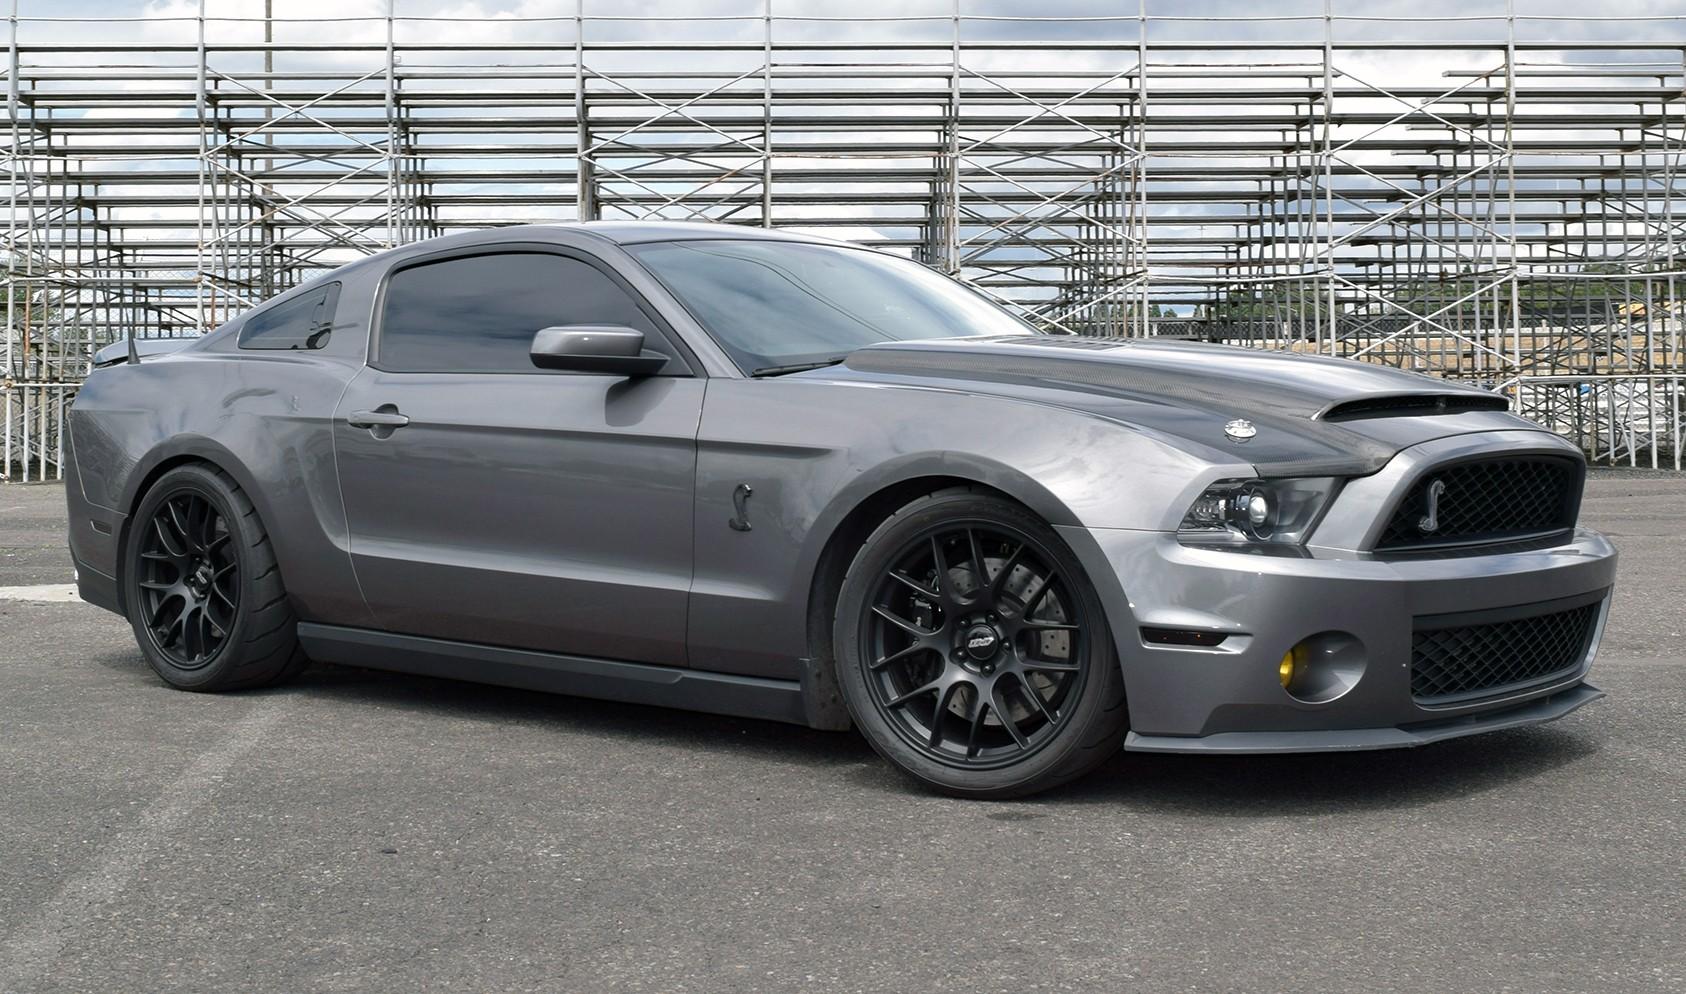 "S197 Staggered Fitment<br />Wheels: Satin Black EC-7 19x10"" ET40 front, 19x11"" ET52 rear<br />Tires: R888R 295-30-19 front, 305/30-19 rear"